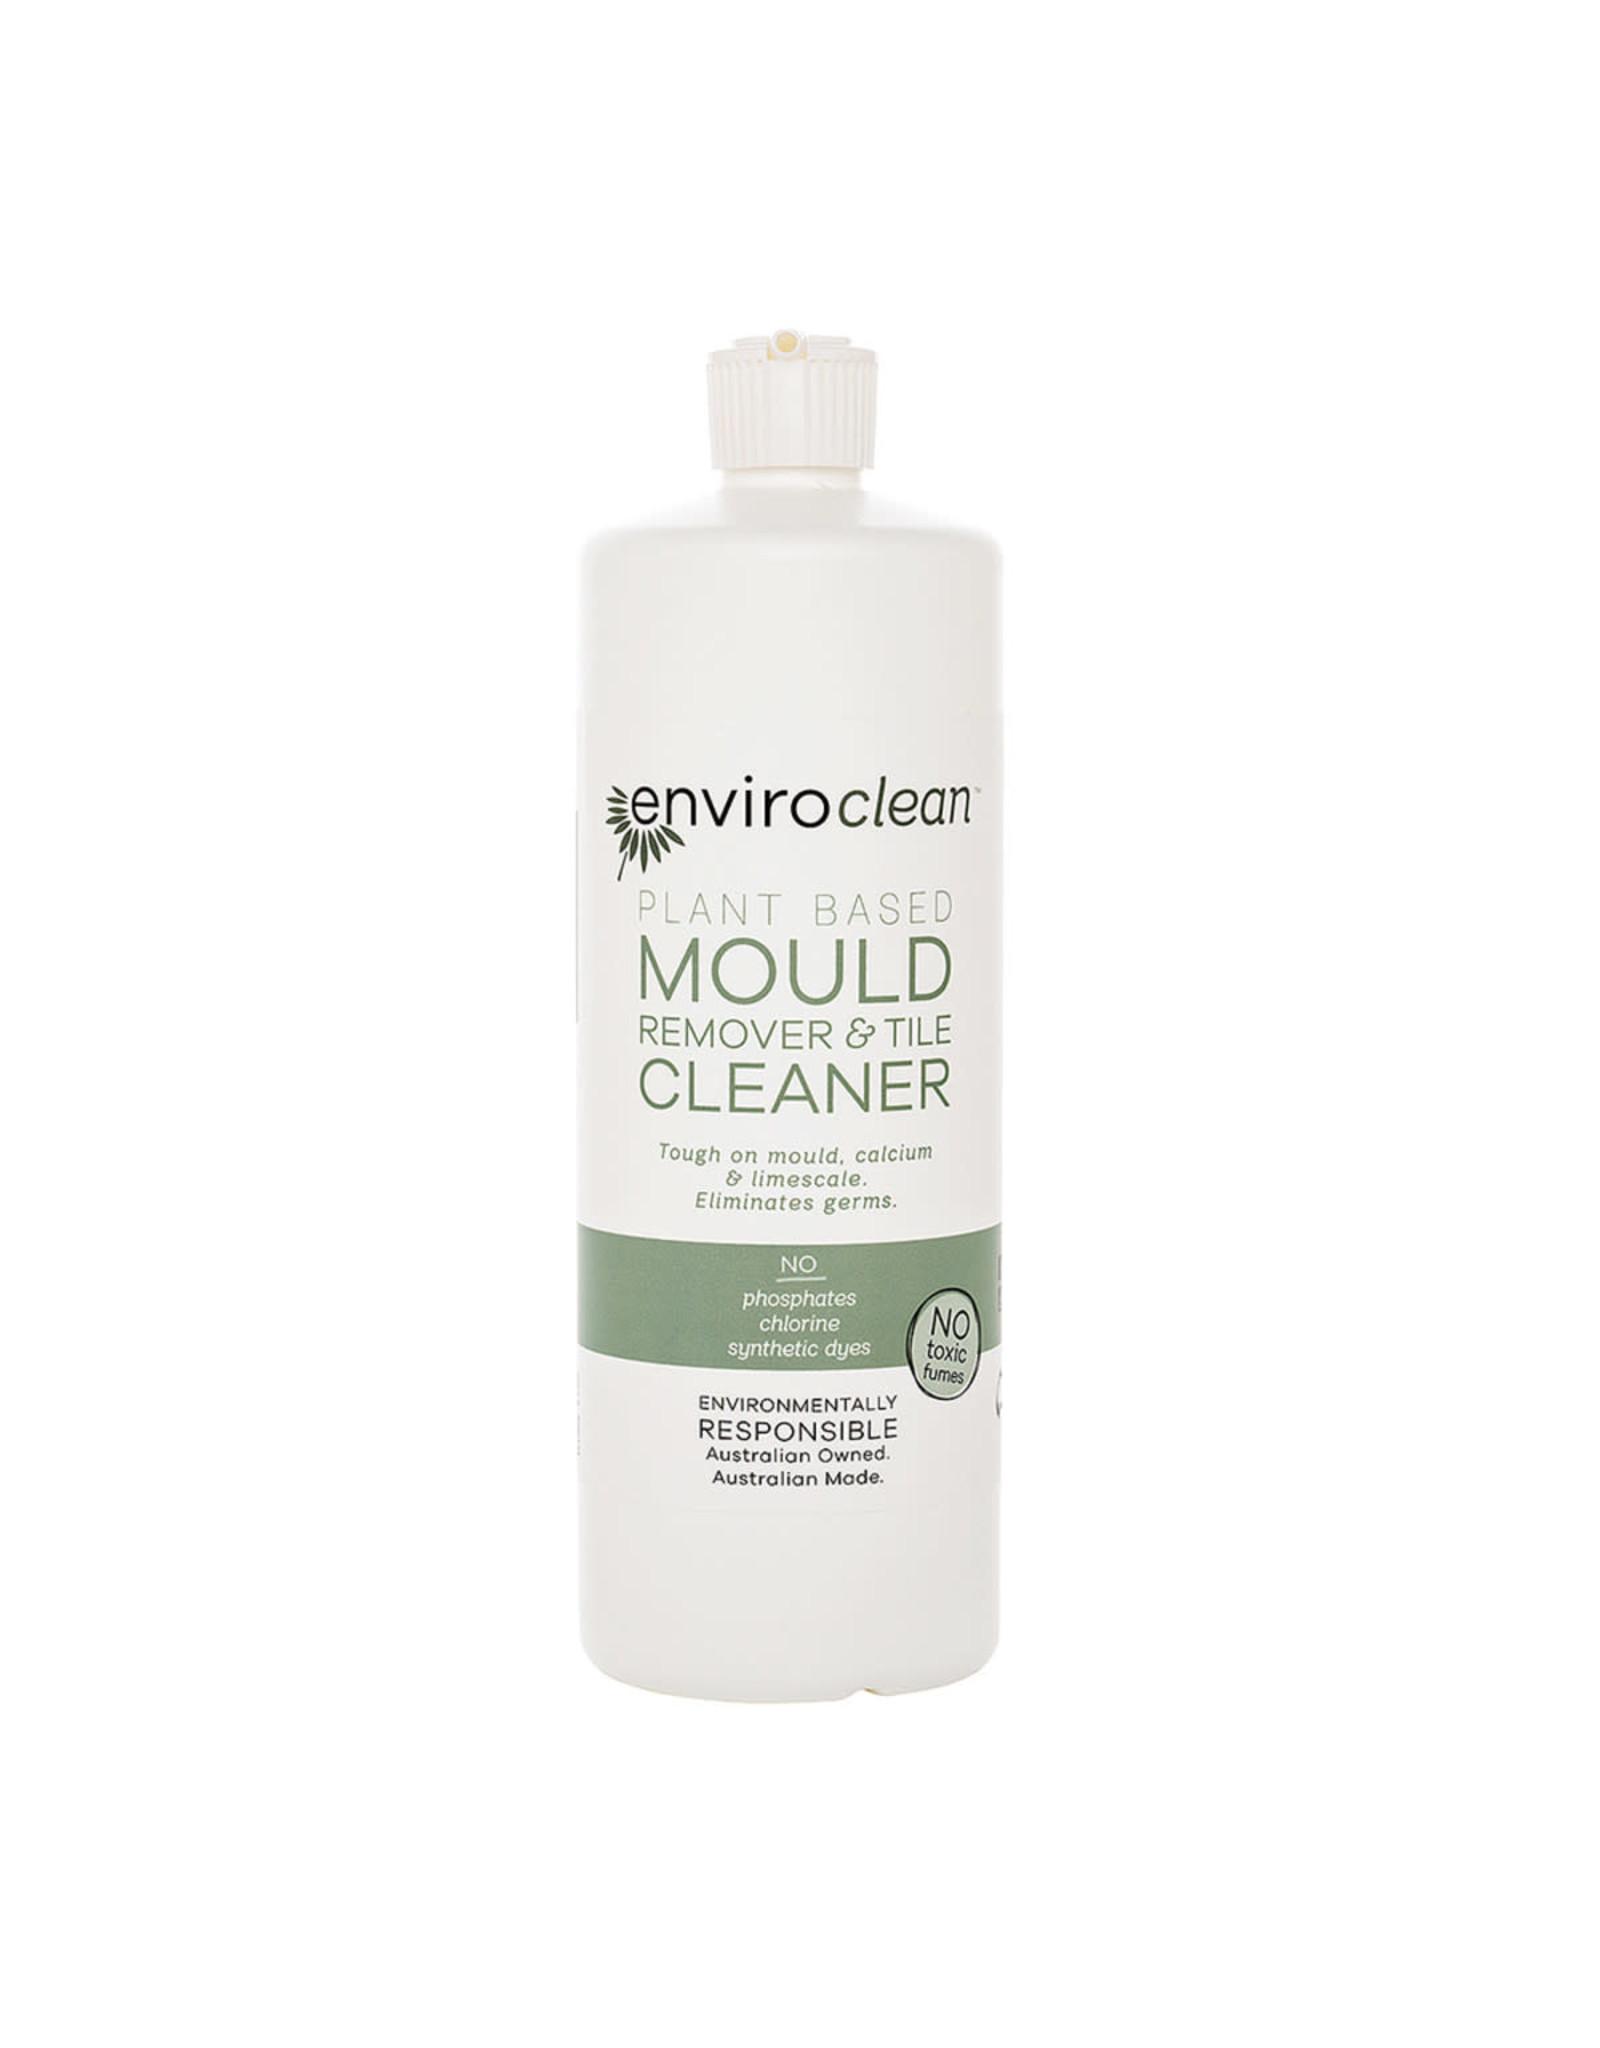 Enviroclean Mould Remover & Tile Cleaner - Plant Based - 1L